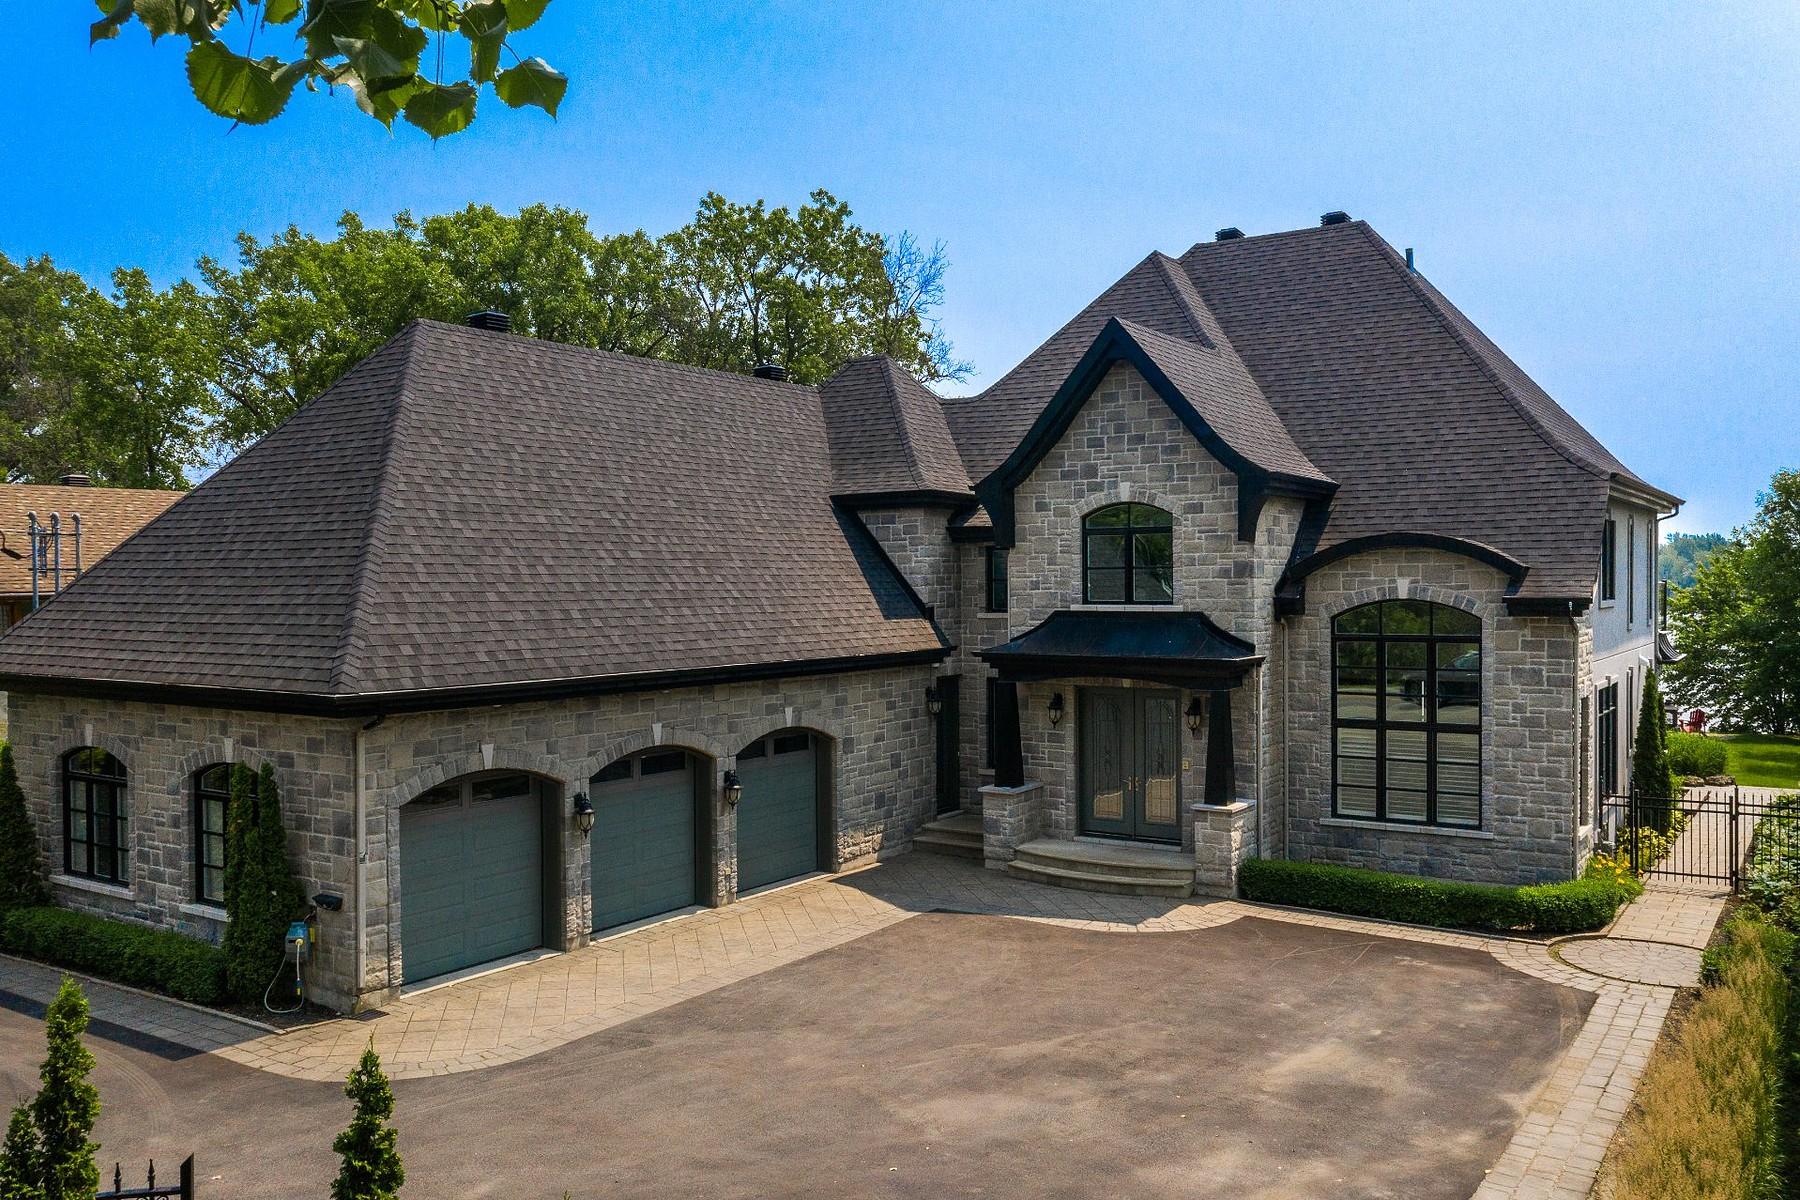 Single Family Homes for Sale at Duvernay, Laval 7408 Boul. Lévesque E. Duvernay, Quebec H7A1R8 Canada